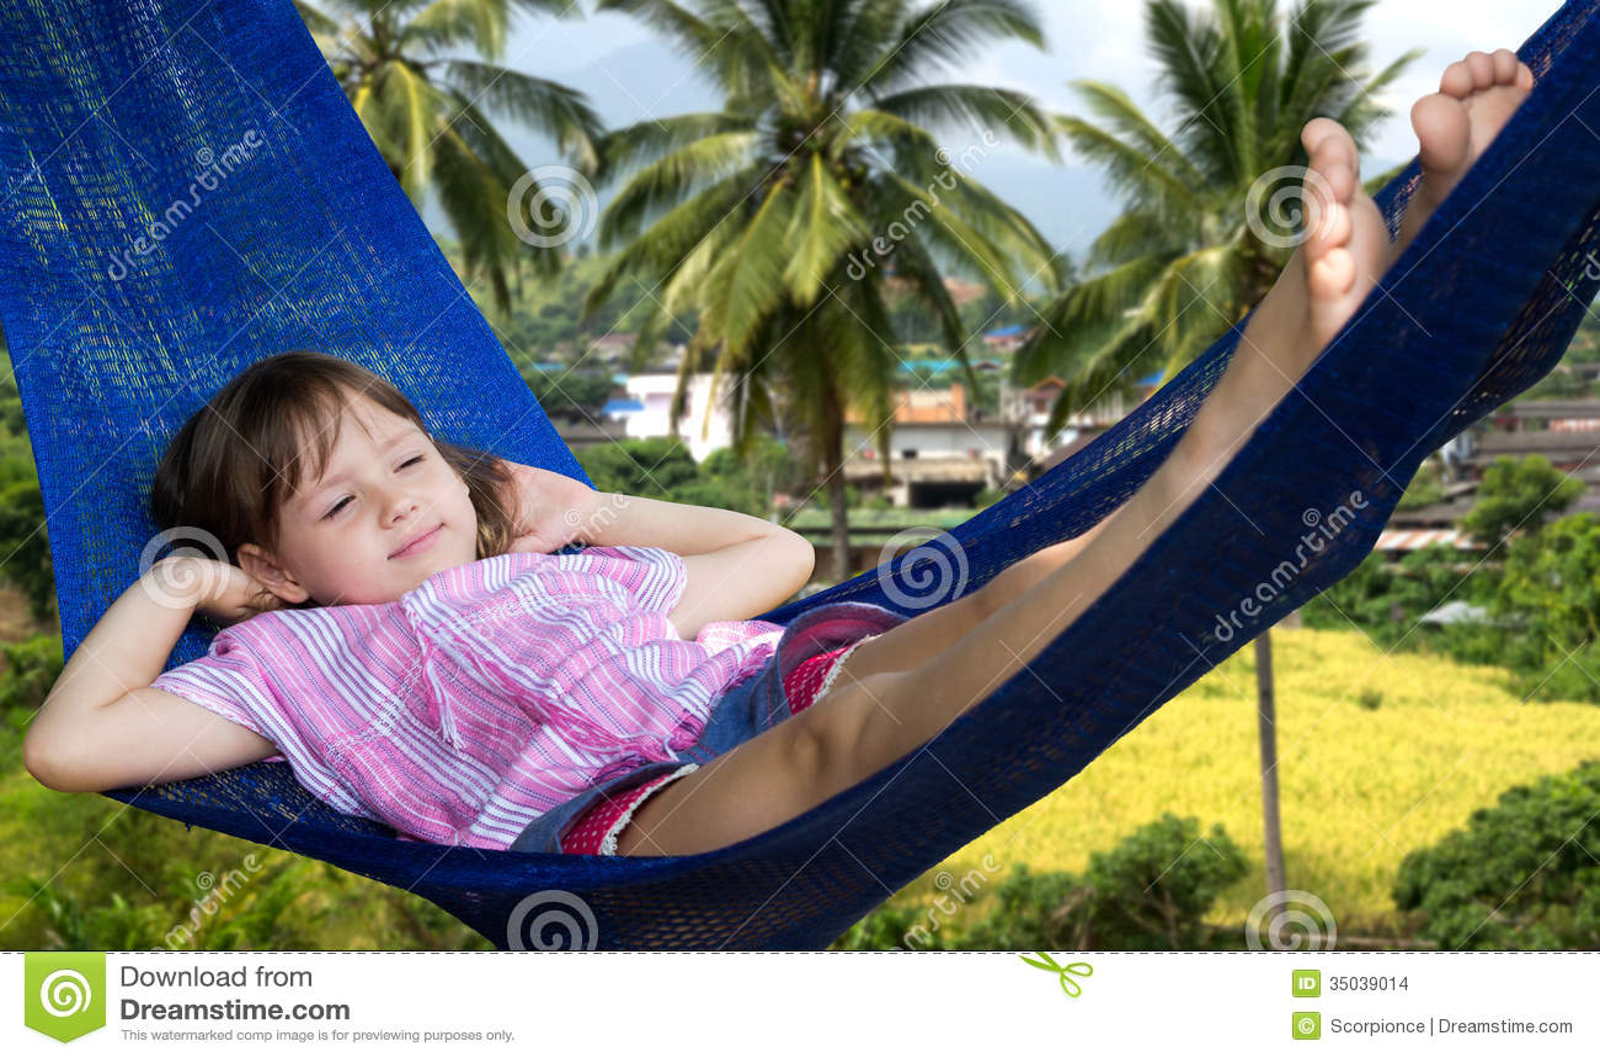 Little Girl Resting In Hammock Stock Photo - Image: 35039014